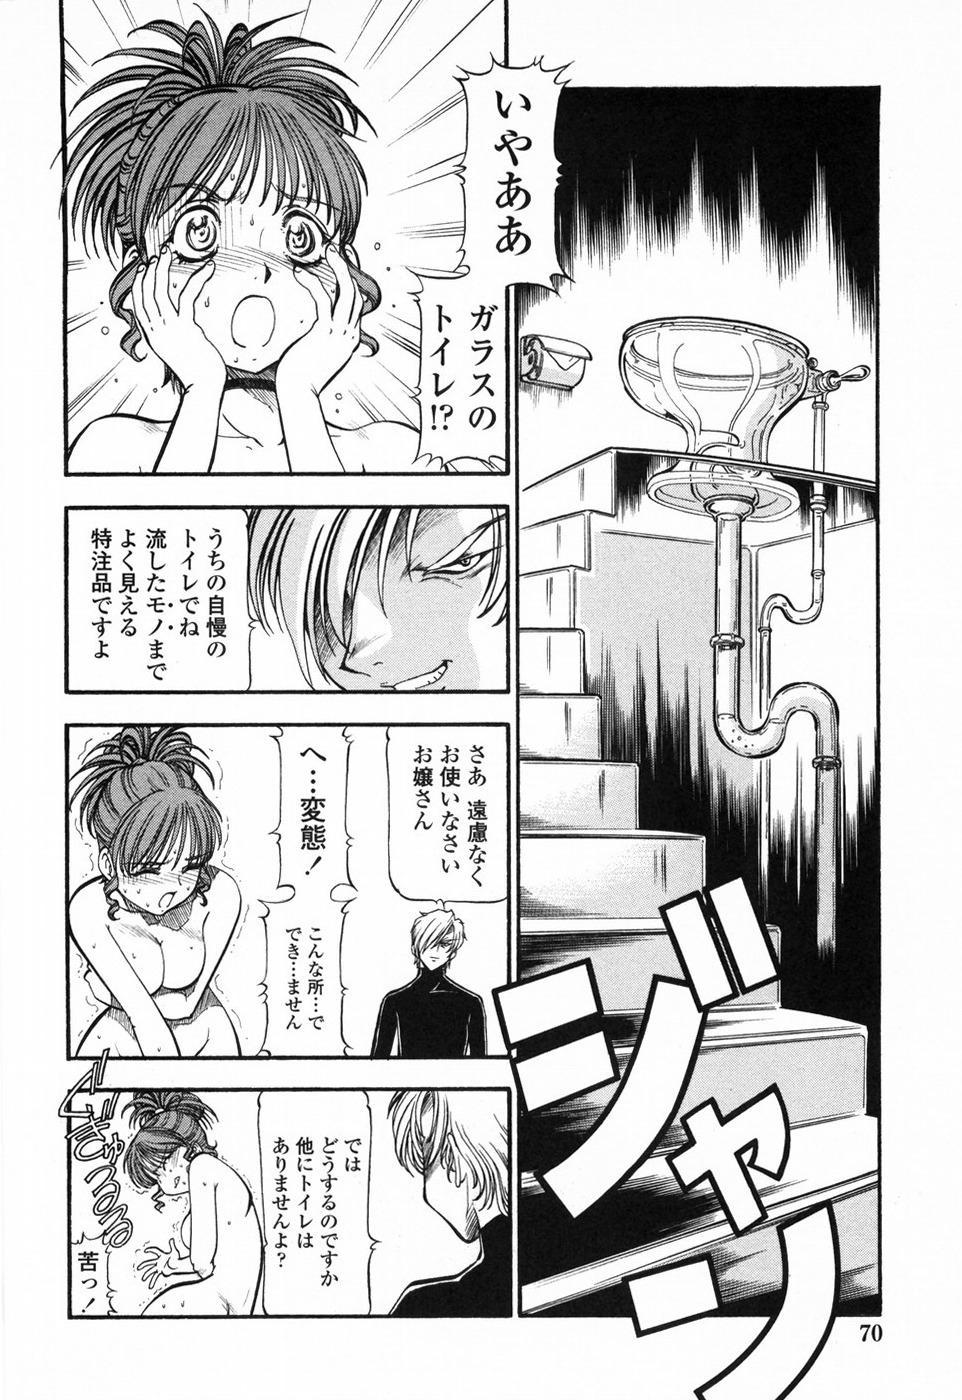 Kichiku Houteishiki - Equation of brutal person 75